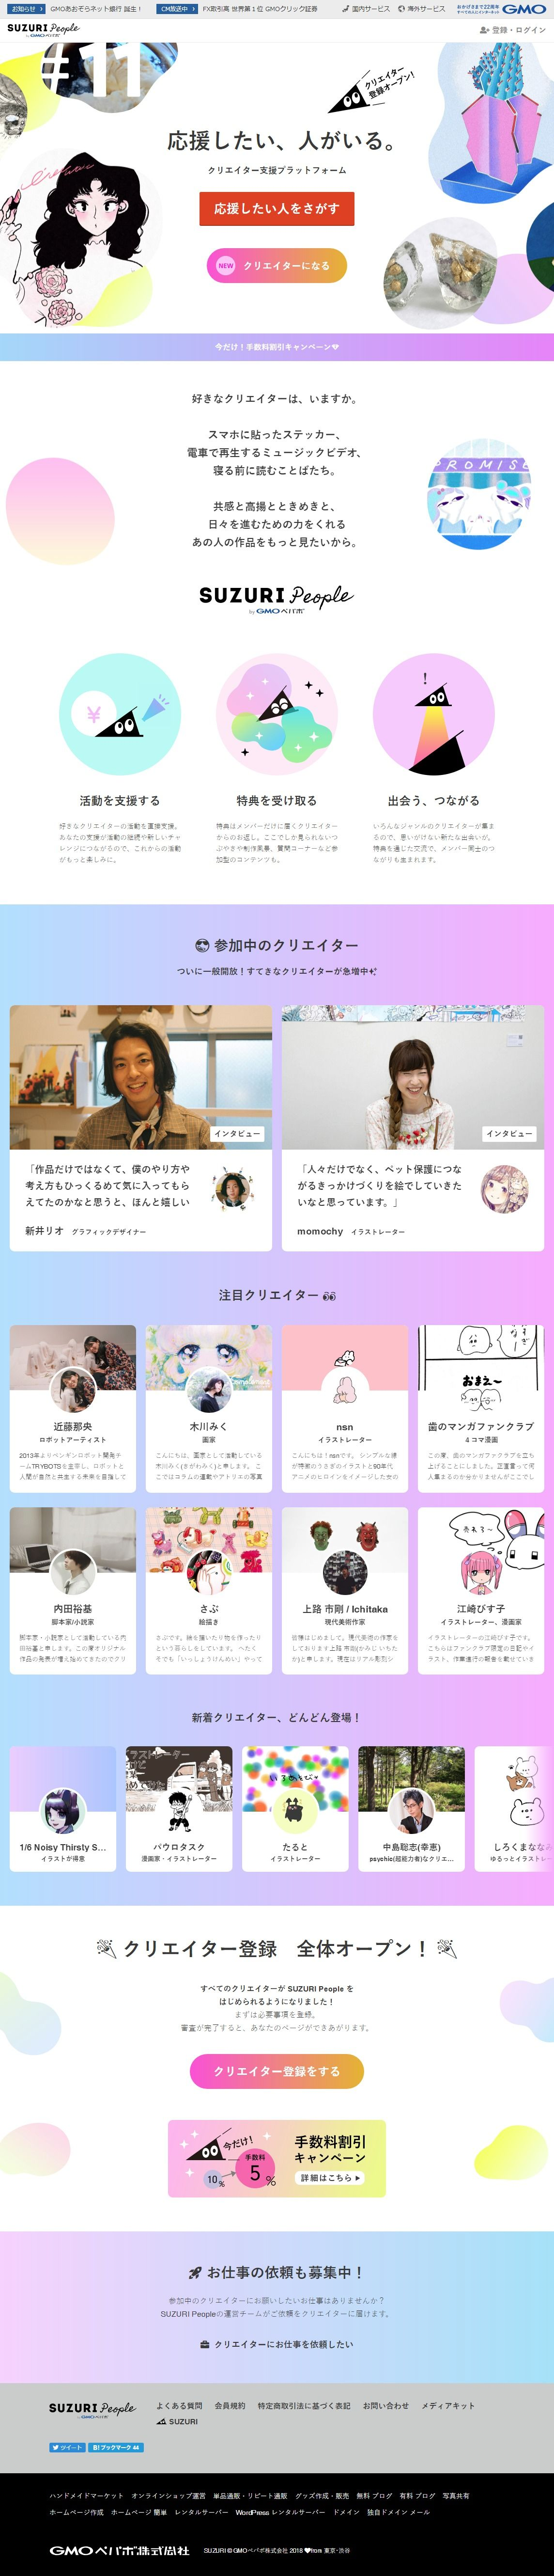 suzuri people sankou lp デザイン ウェブデザイン webデザイン